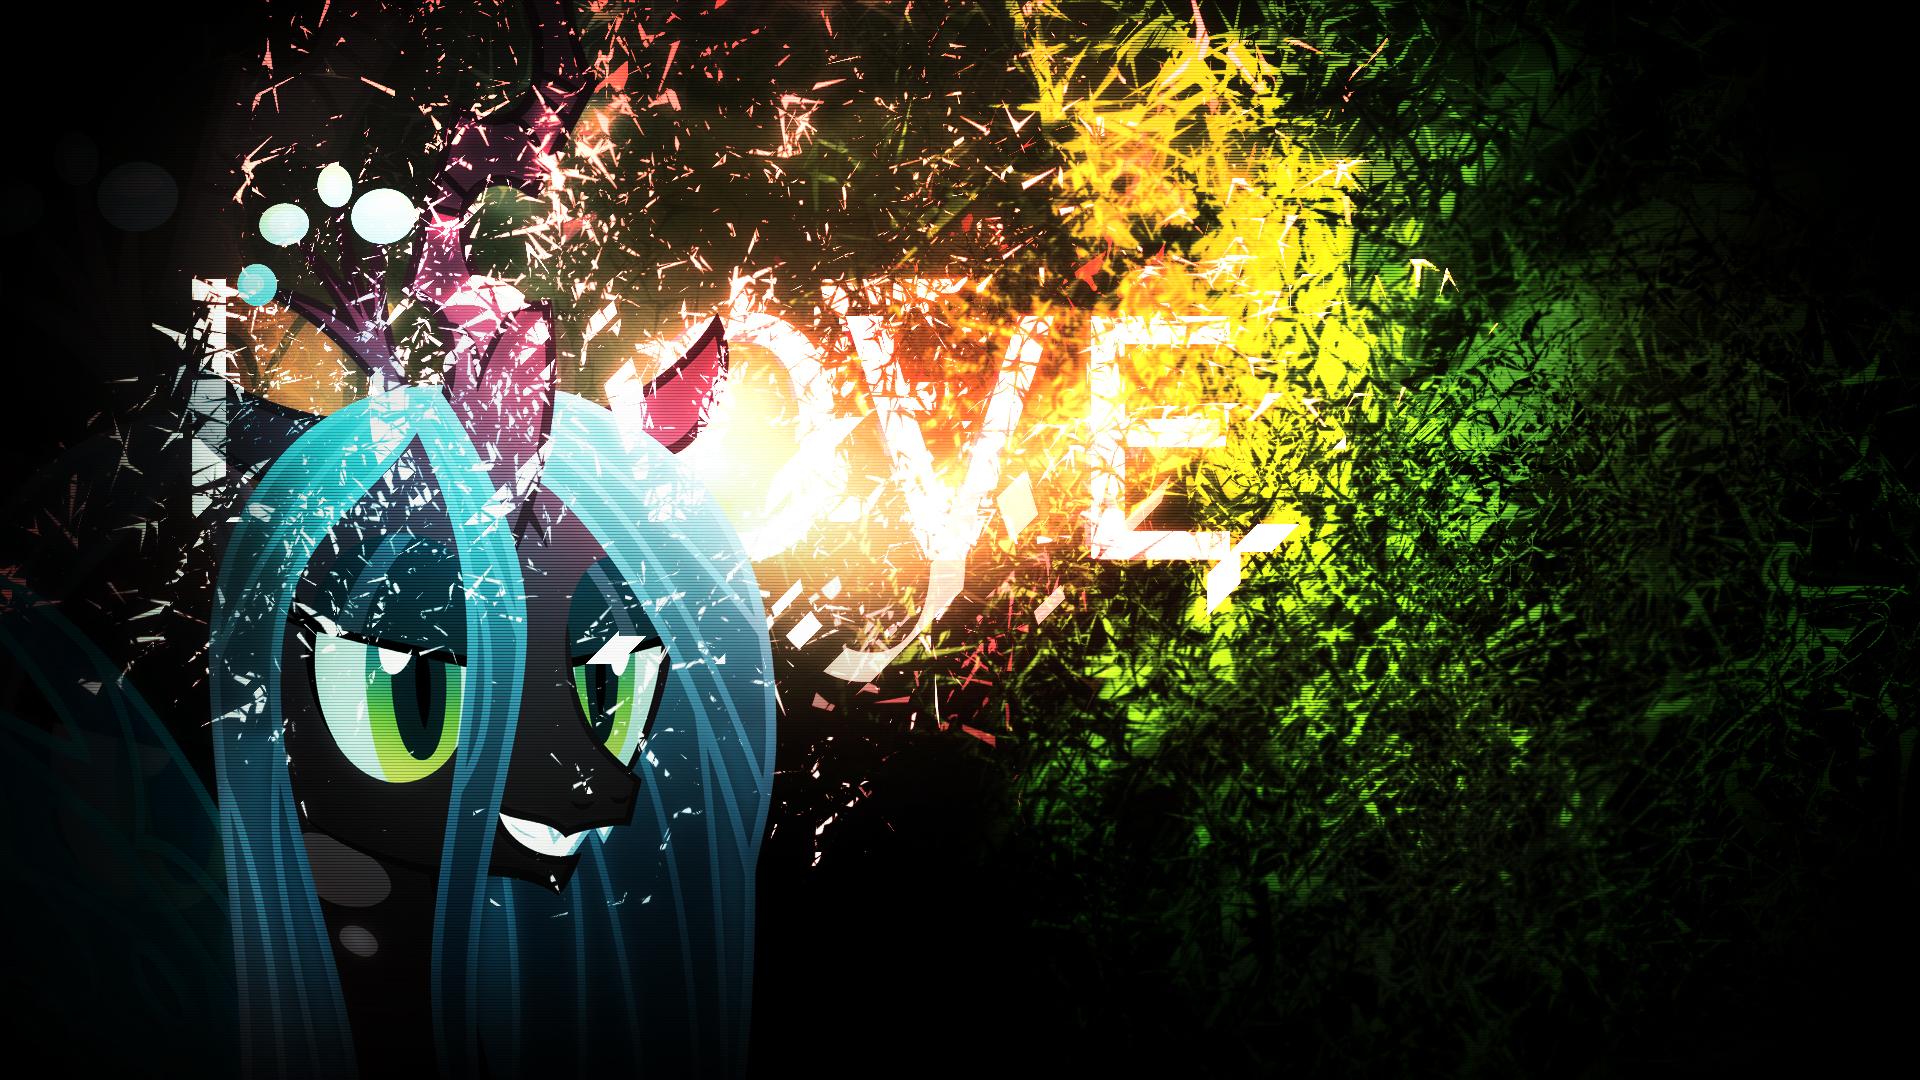 Chrysalis Love by Xtrl and zakbo1337